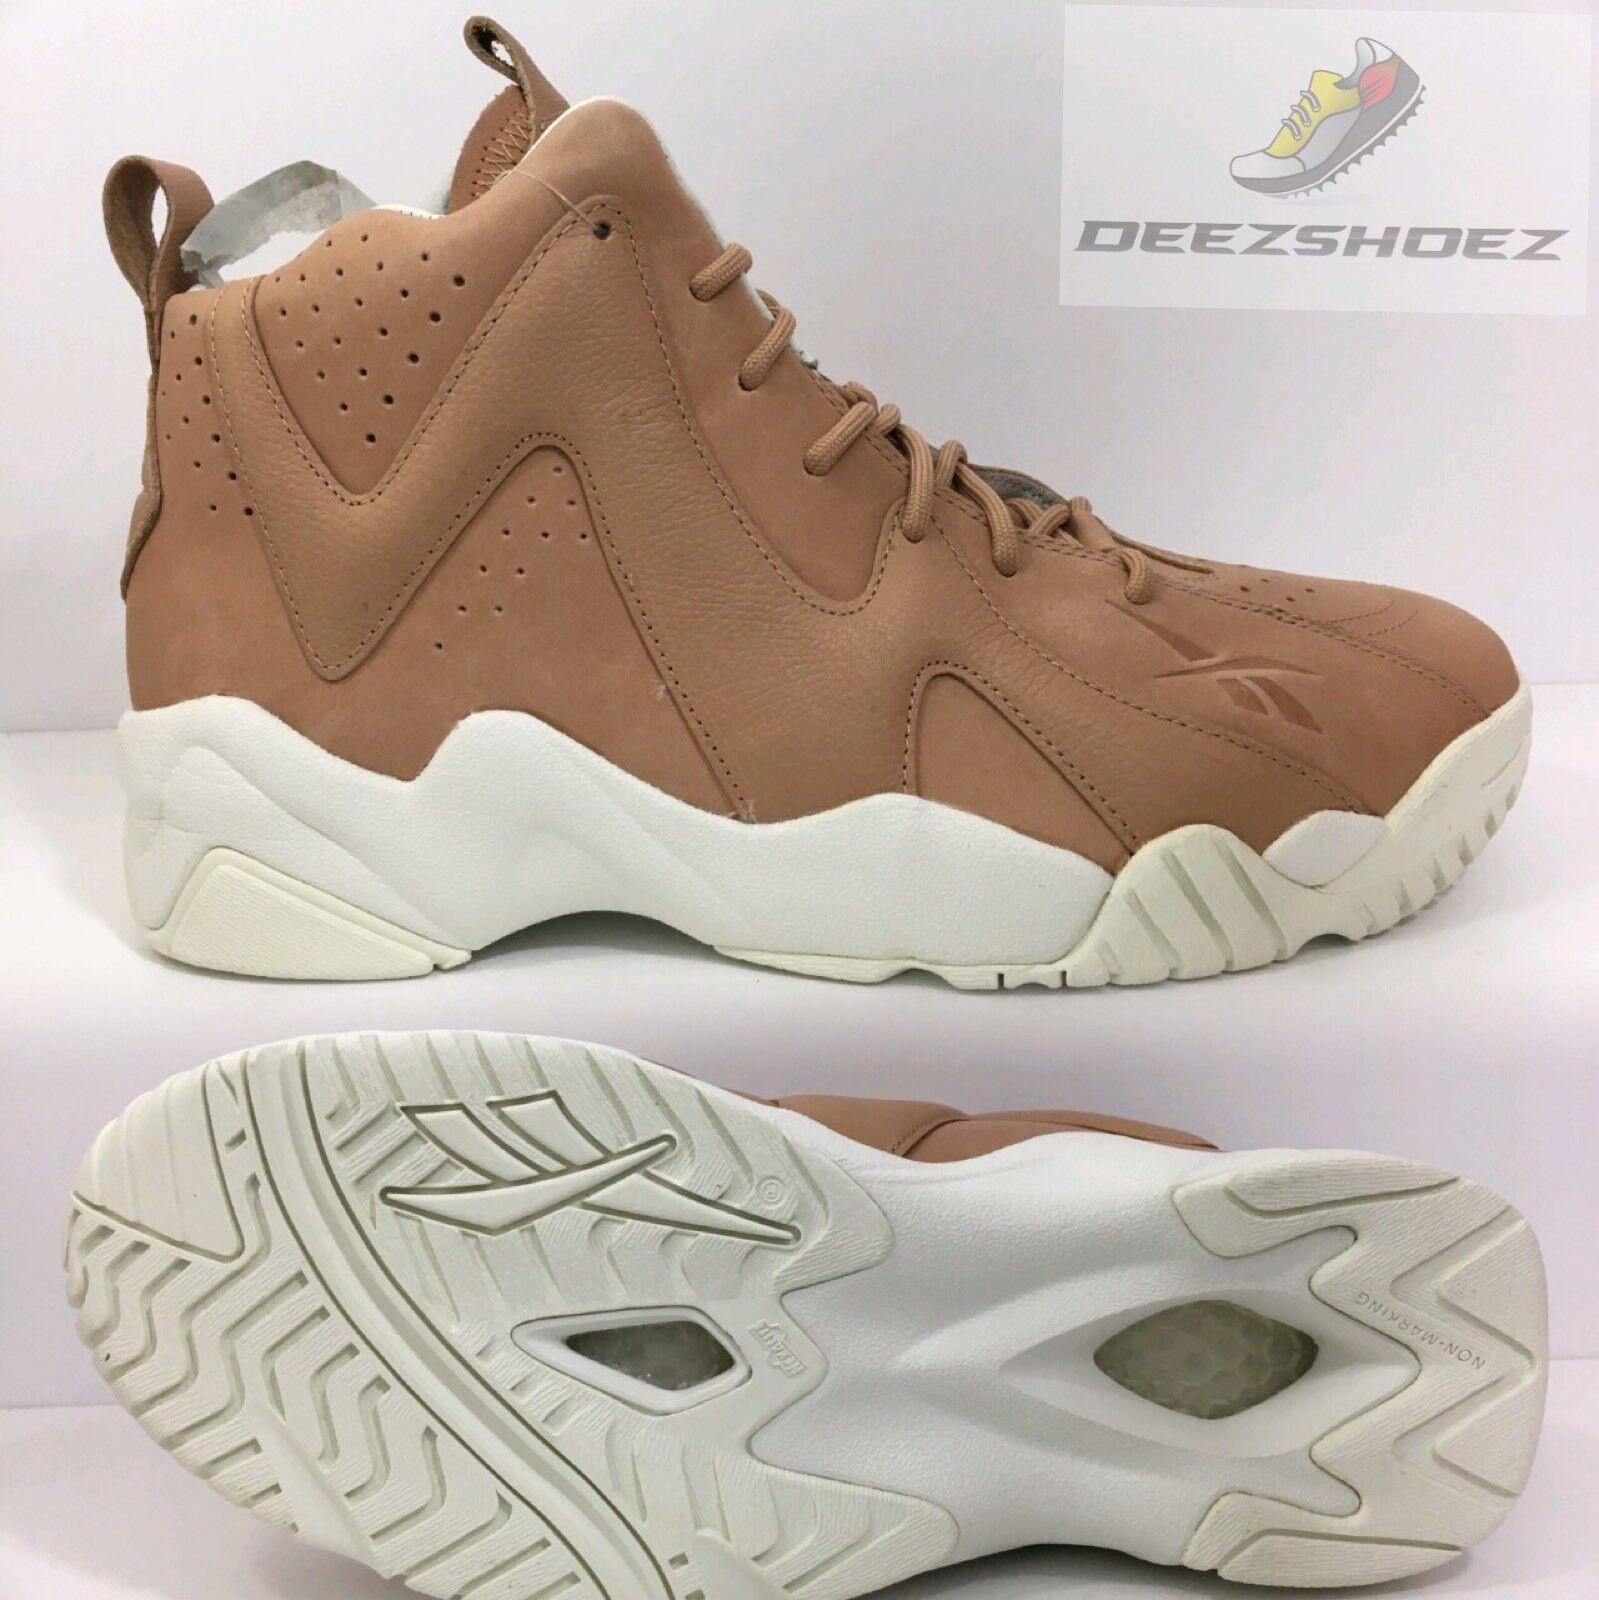 Reebok Kamikaze II Tan uomo BasketBall Sneakers BS9669 US Size 11 Free Shipping Scarpe classiche da uomo